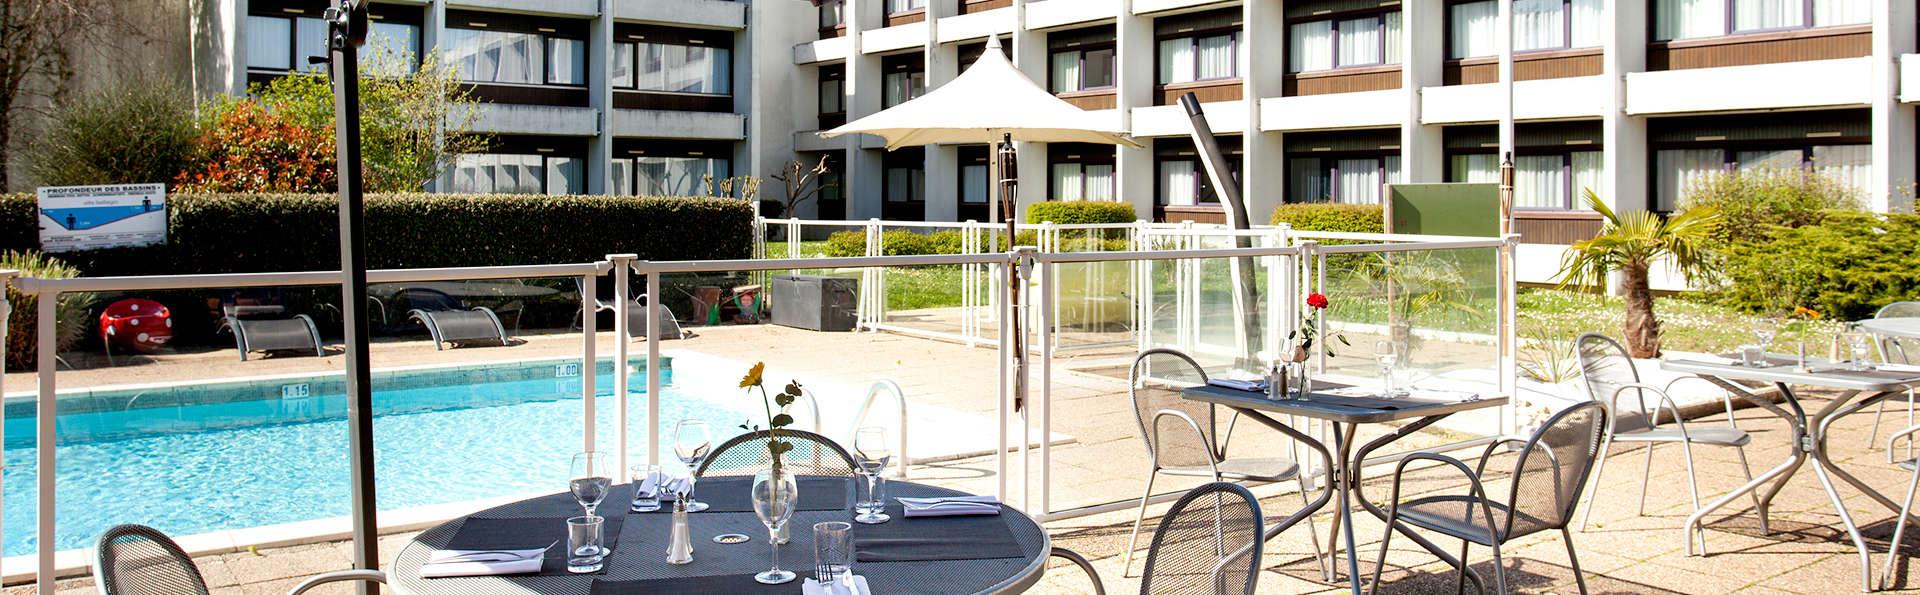 Villa Bellagio Blois - EDIT_NEW_TERRACE2.jpg